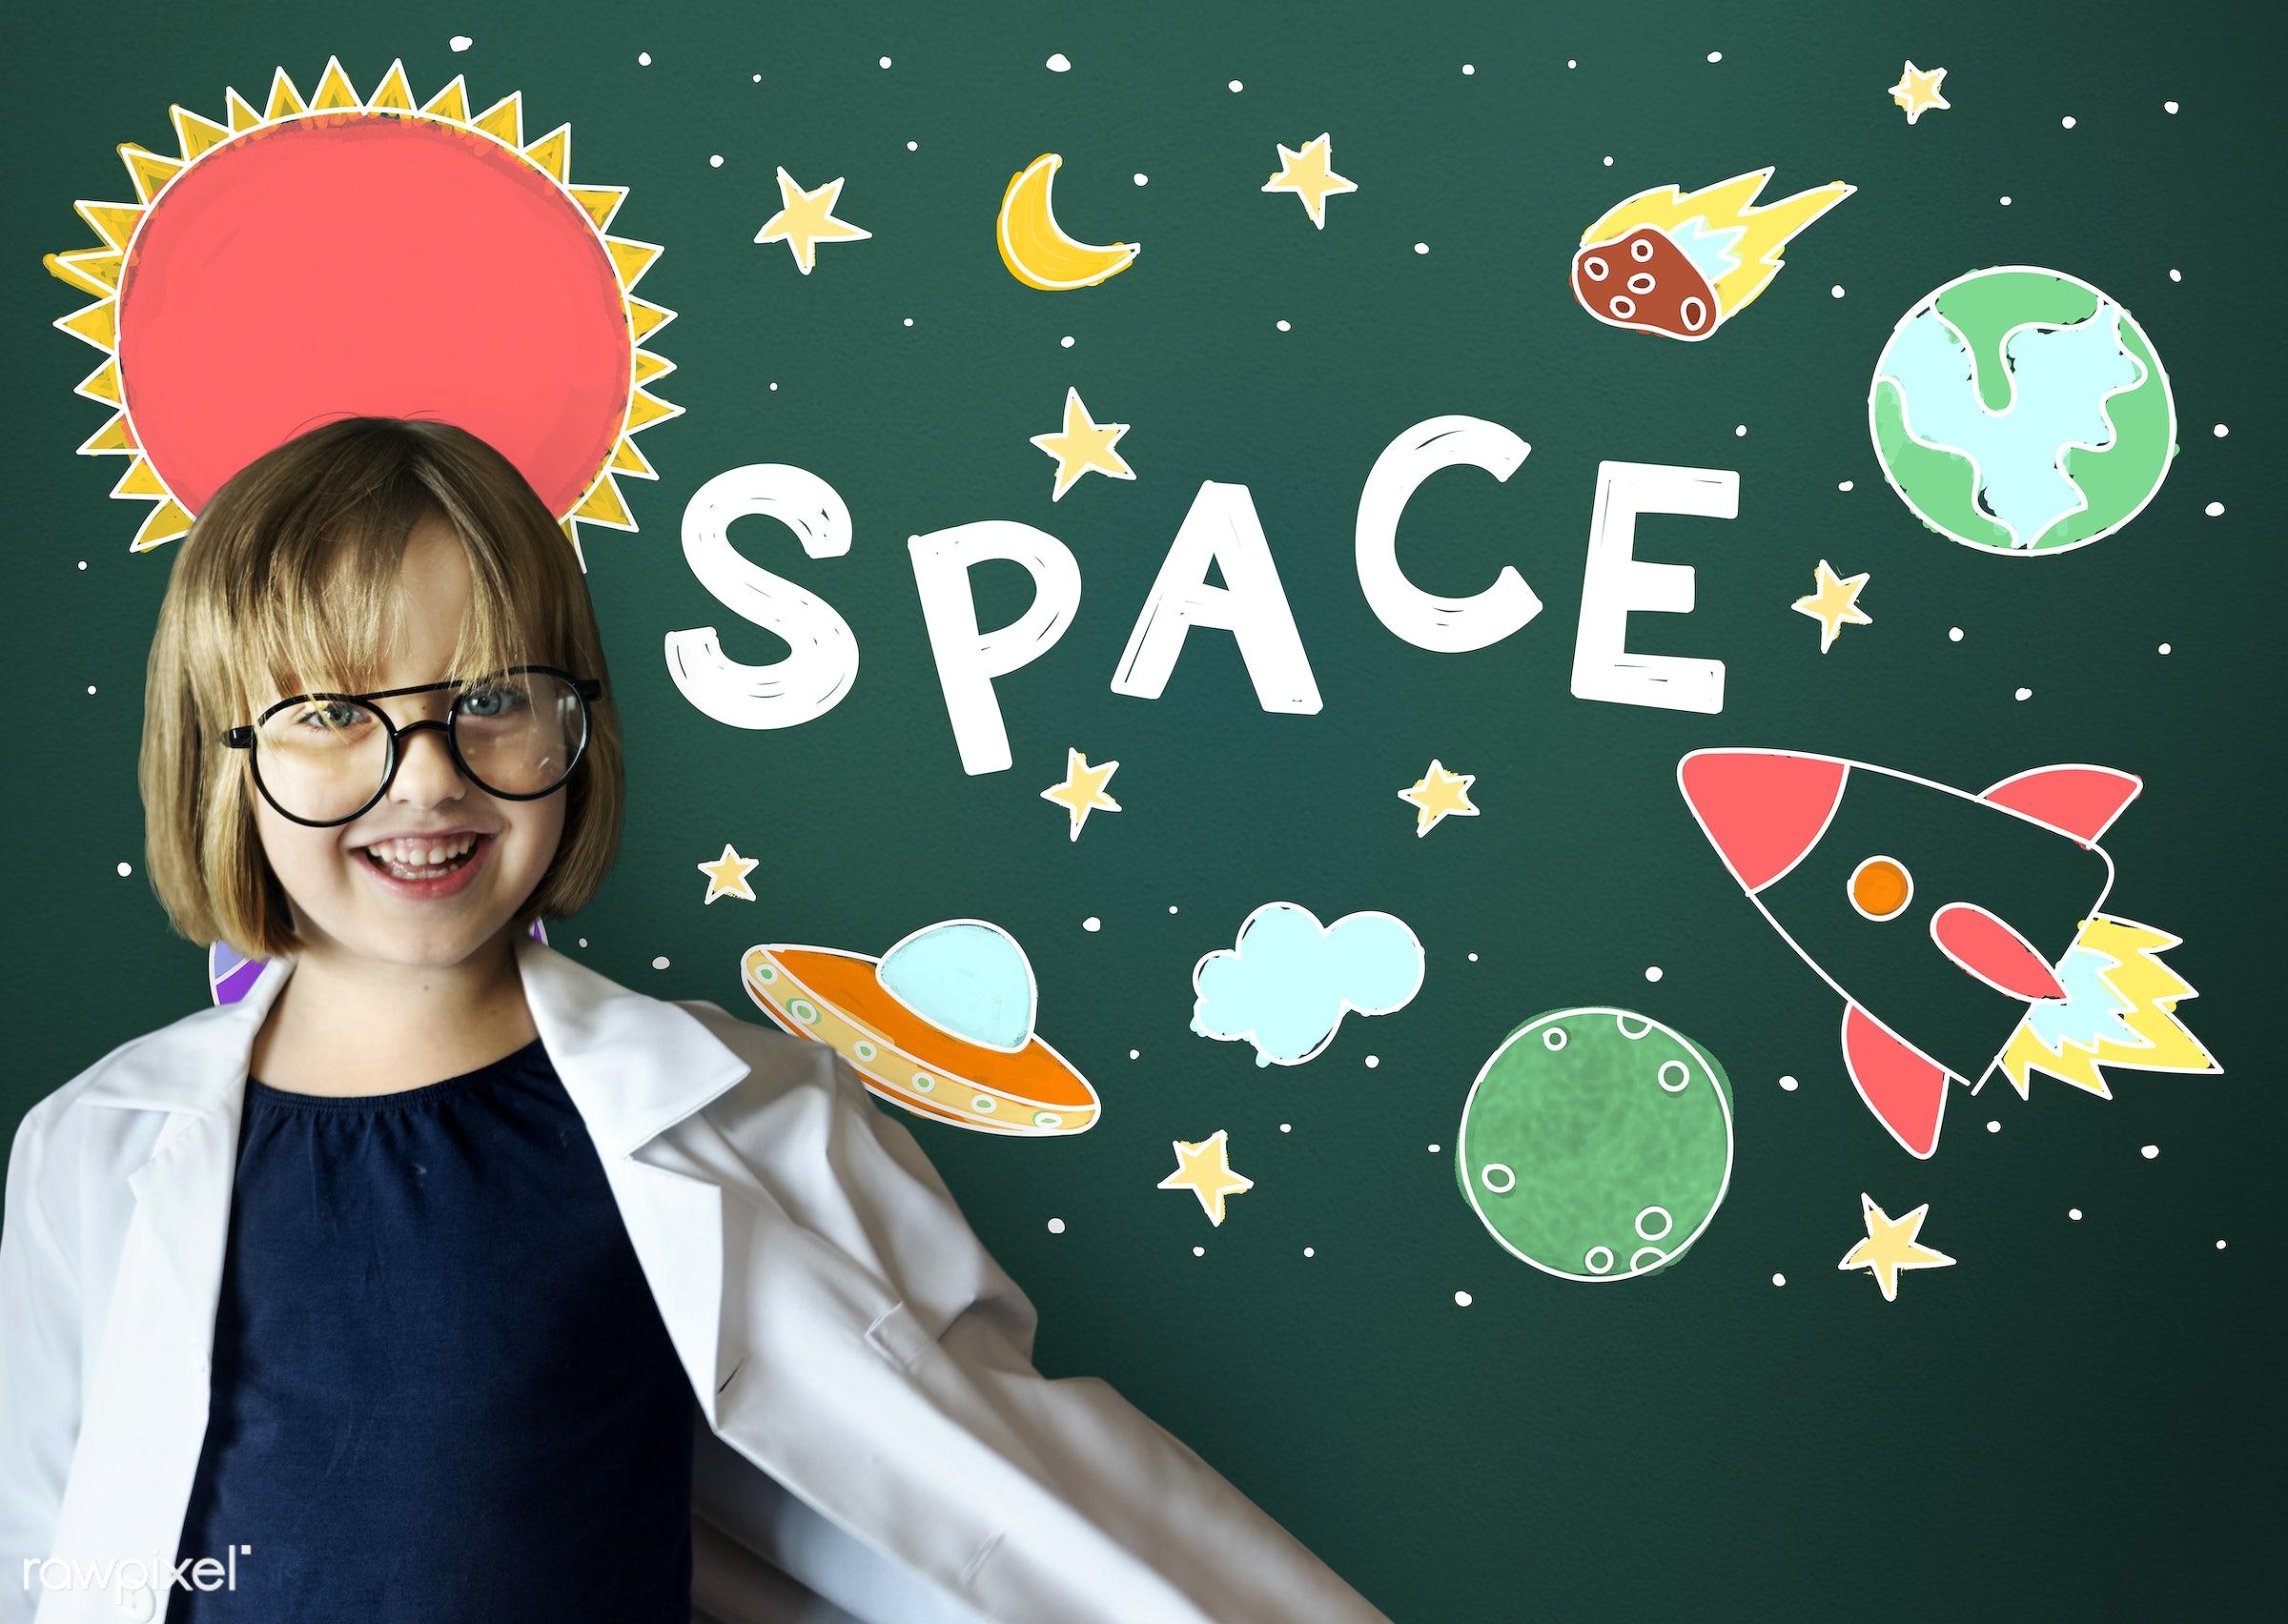 adorable, astrology, astronomy, blackboard, cheerful, child, childhood, cosmos, curiosity, cute, drawing, dream job,...